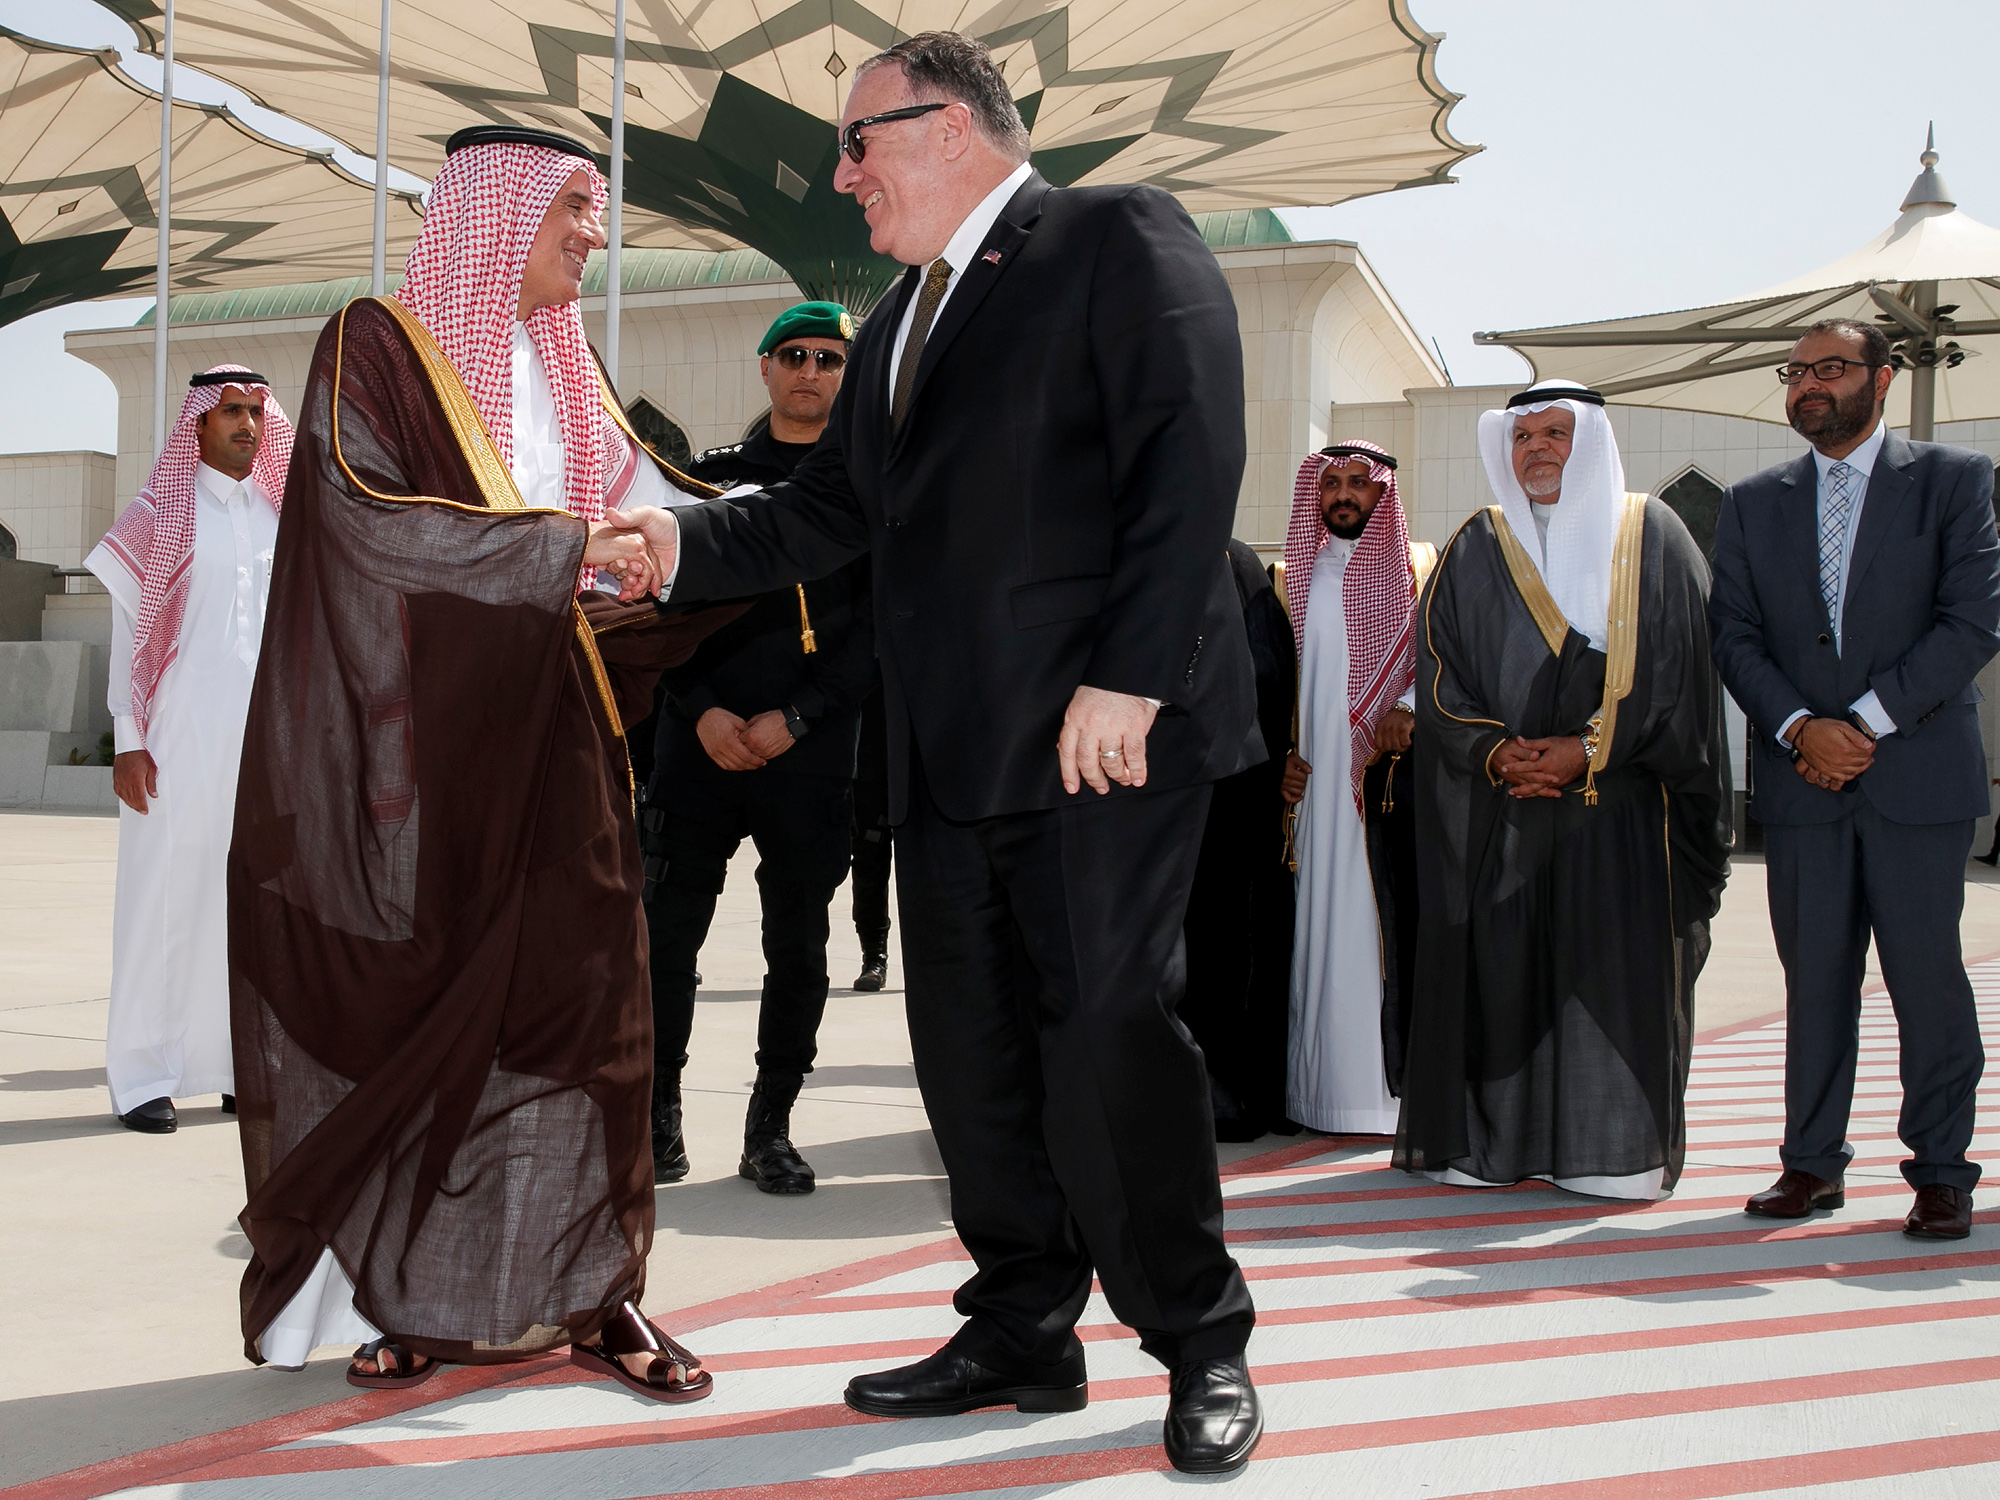 Talks in Riyadh on Iran: What happens next? - Atlantic Council